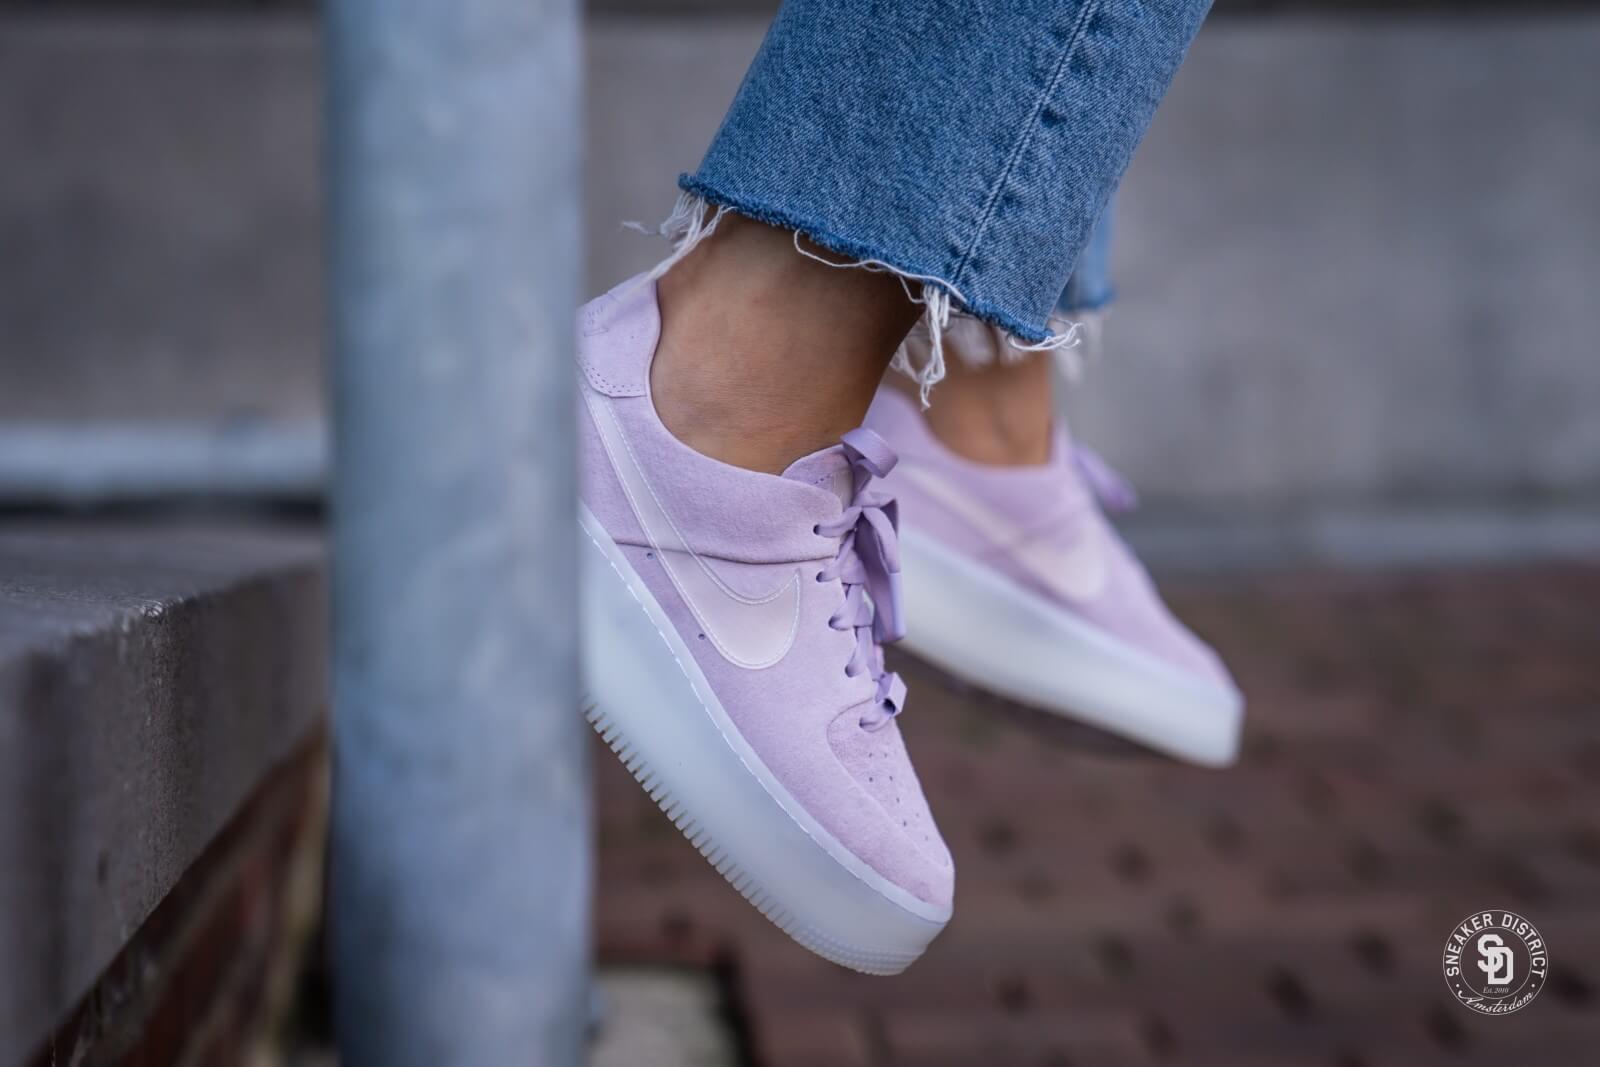 Nike Women's Air Force 1 Sage Low LX Violet Mist/Violet Mist